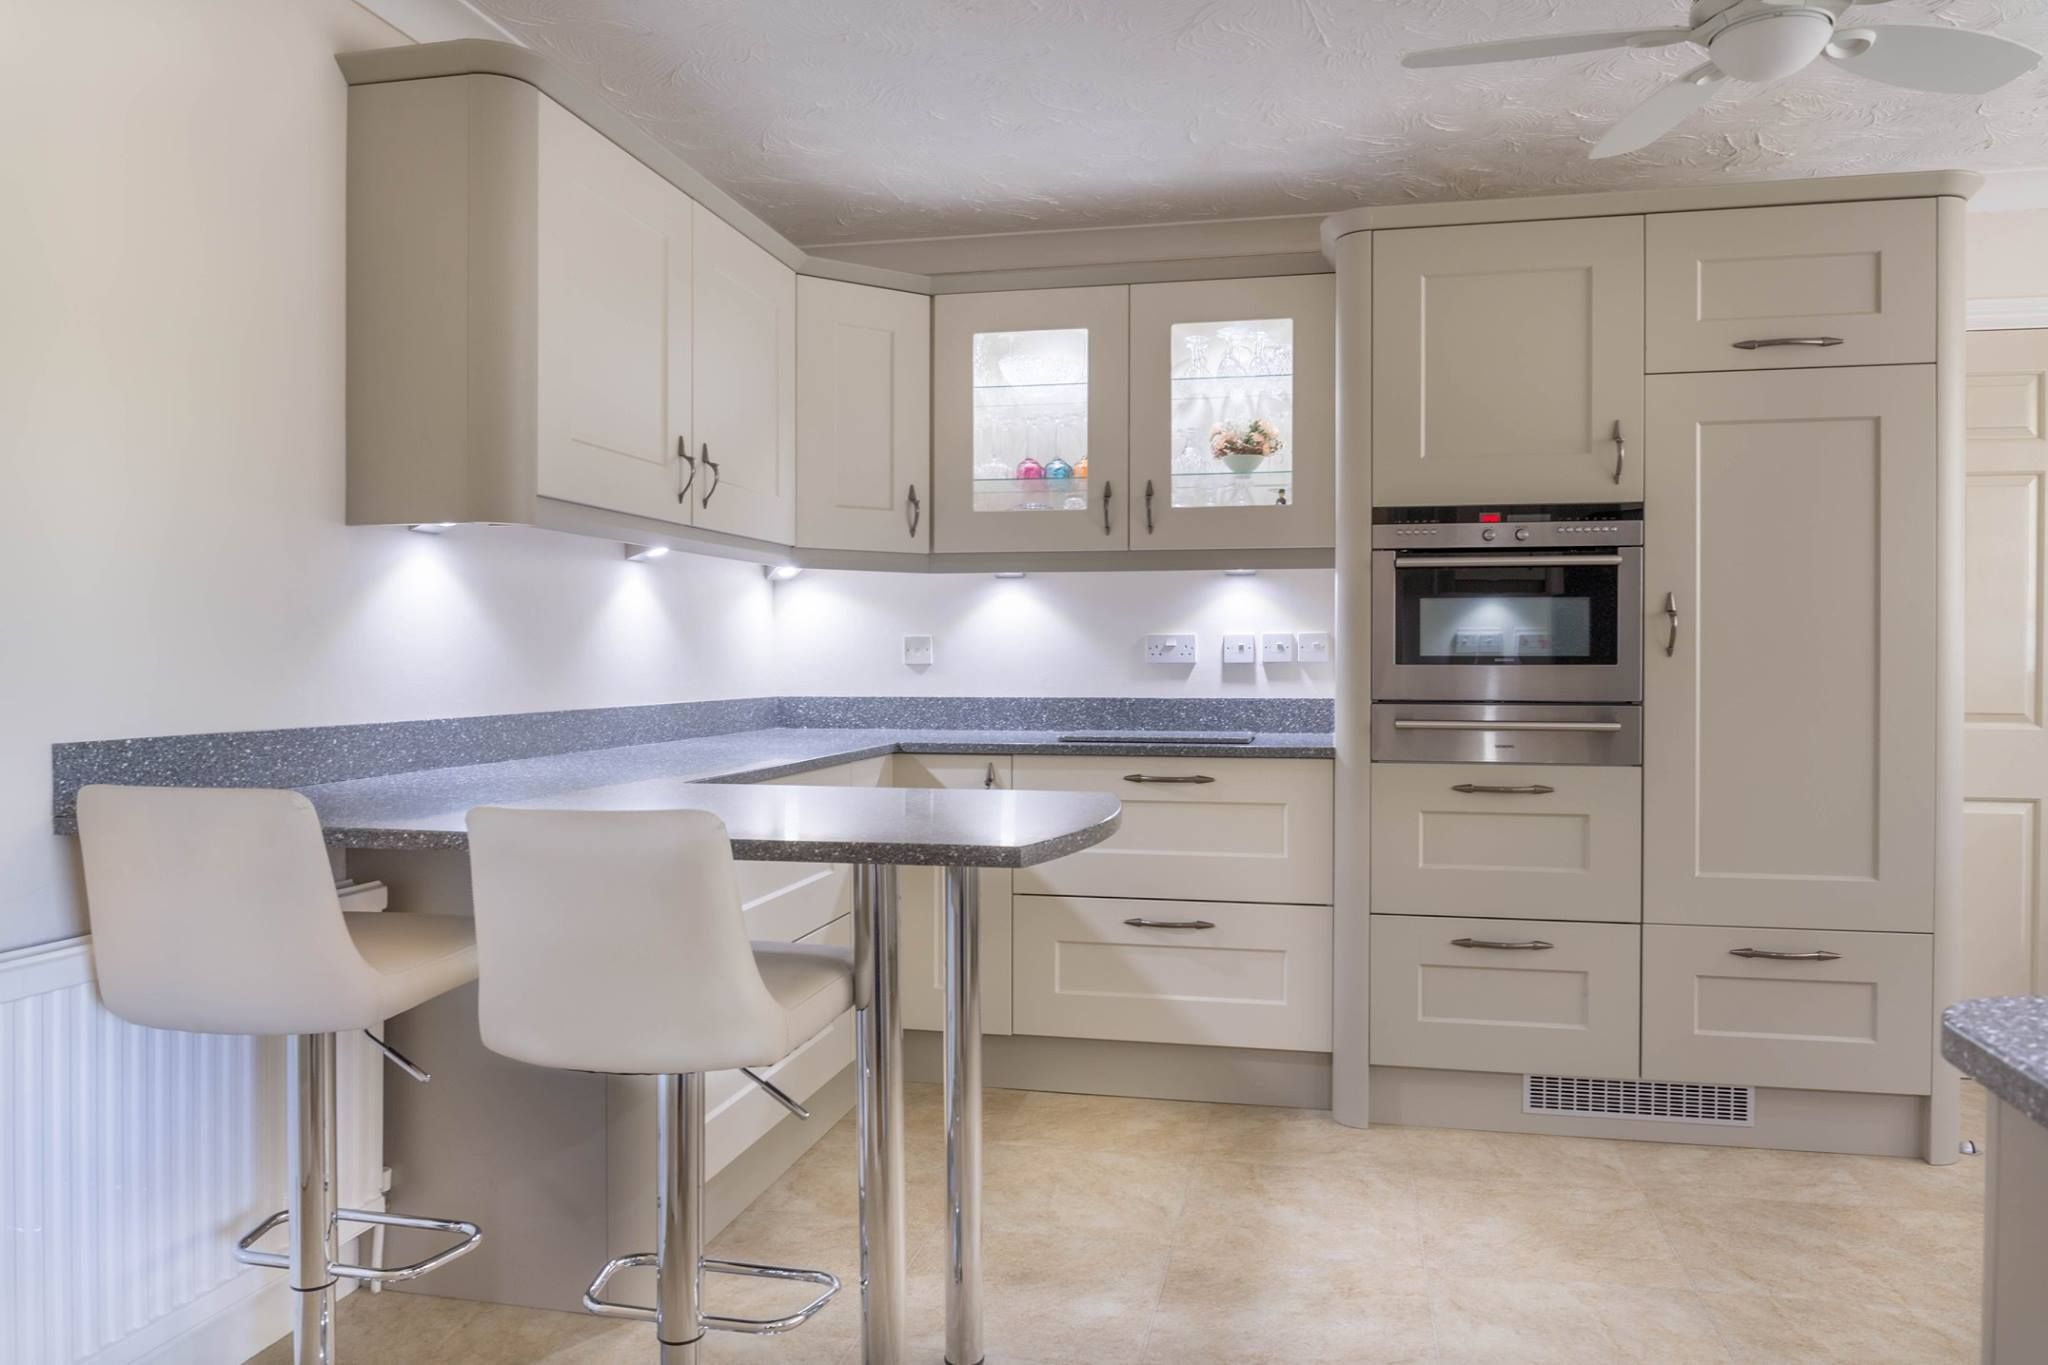 Uncategorized Kitchen Design Cambridge mussel matt kitchen door dakar cambridge by woollards of mildenhall